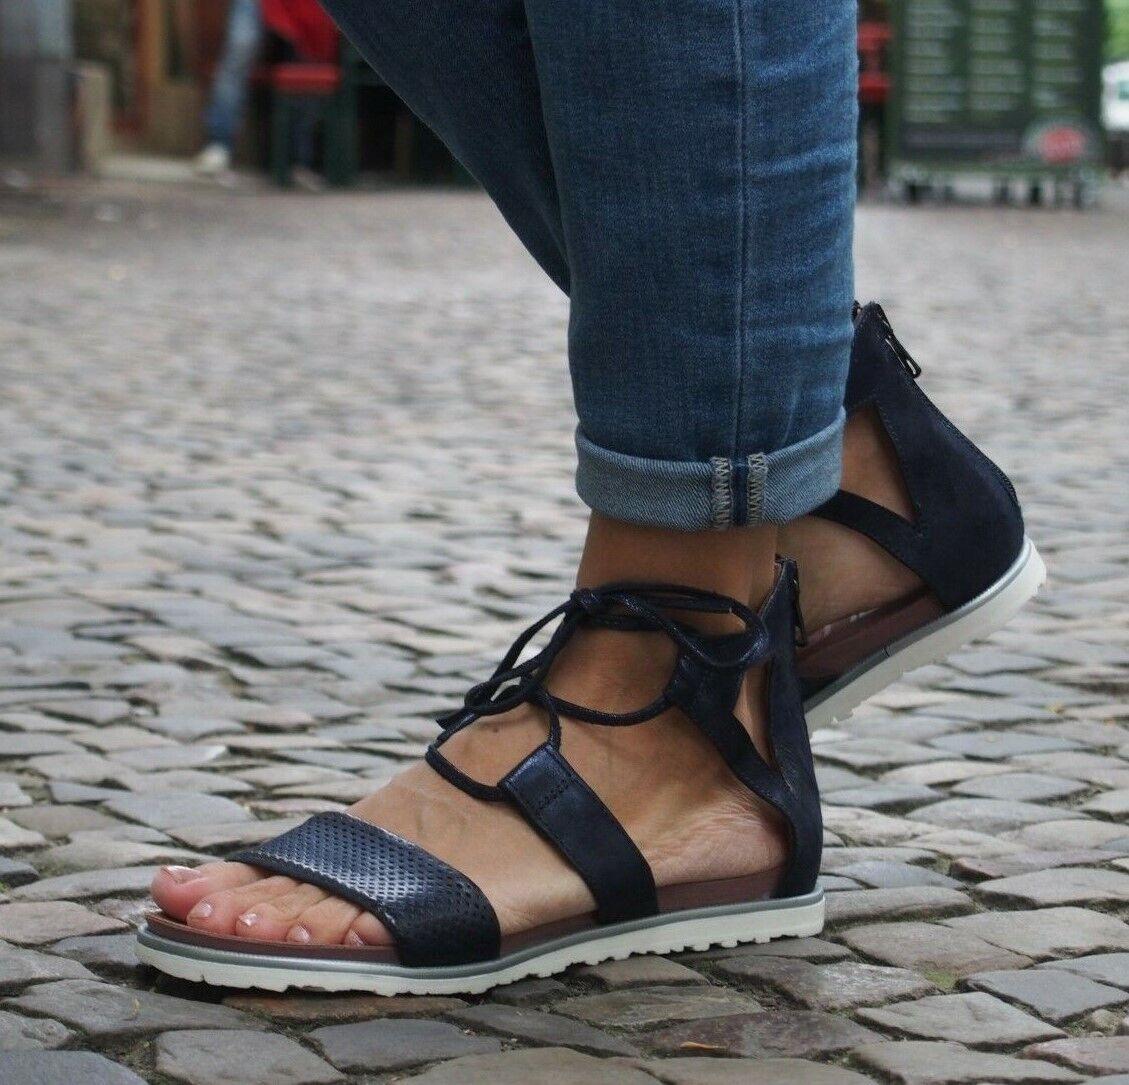 MJUS Schuhe TITLE-LICIA space dunkelblau 255067 Echtleder Damensandalen Sandalen